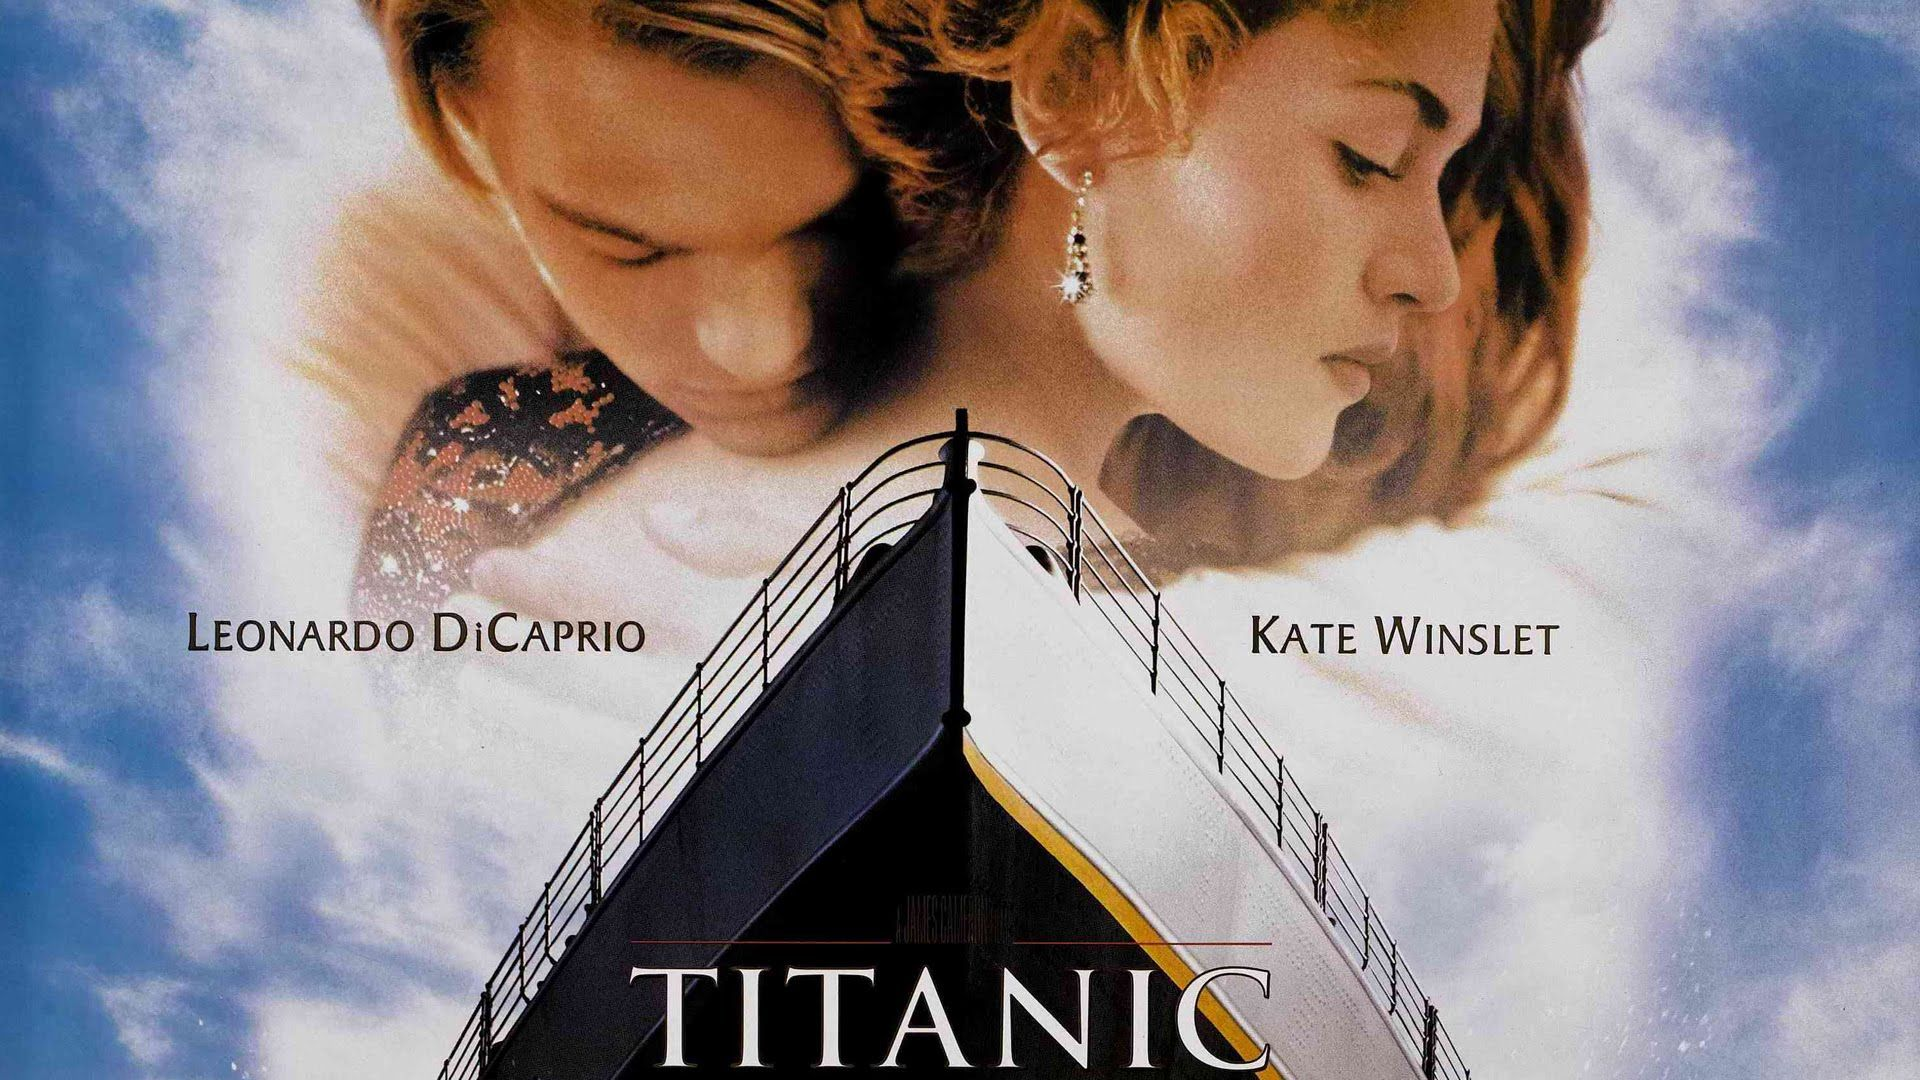 Titanic 2012 Dublado Completo Hd Titanic Titanic Filme Leonardo Dicaprio Kate Winslet